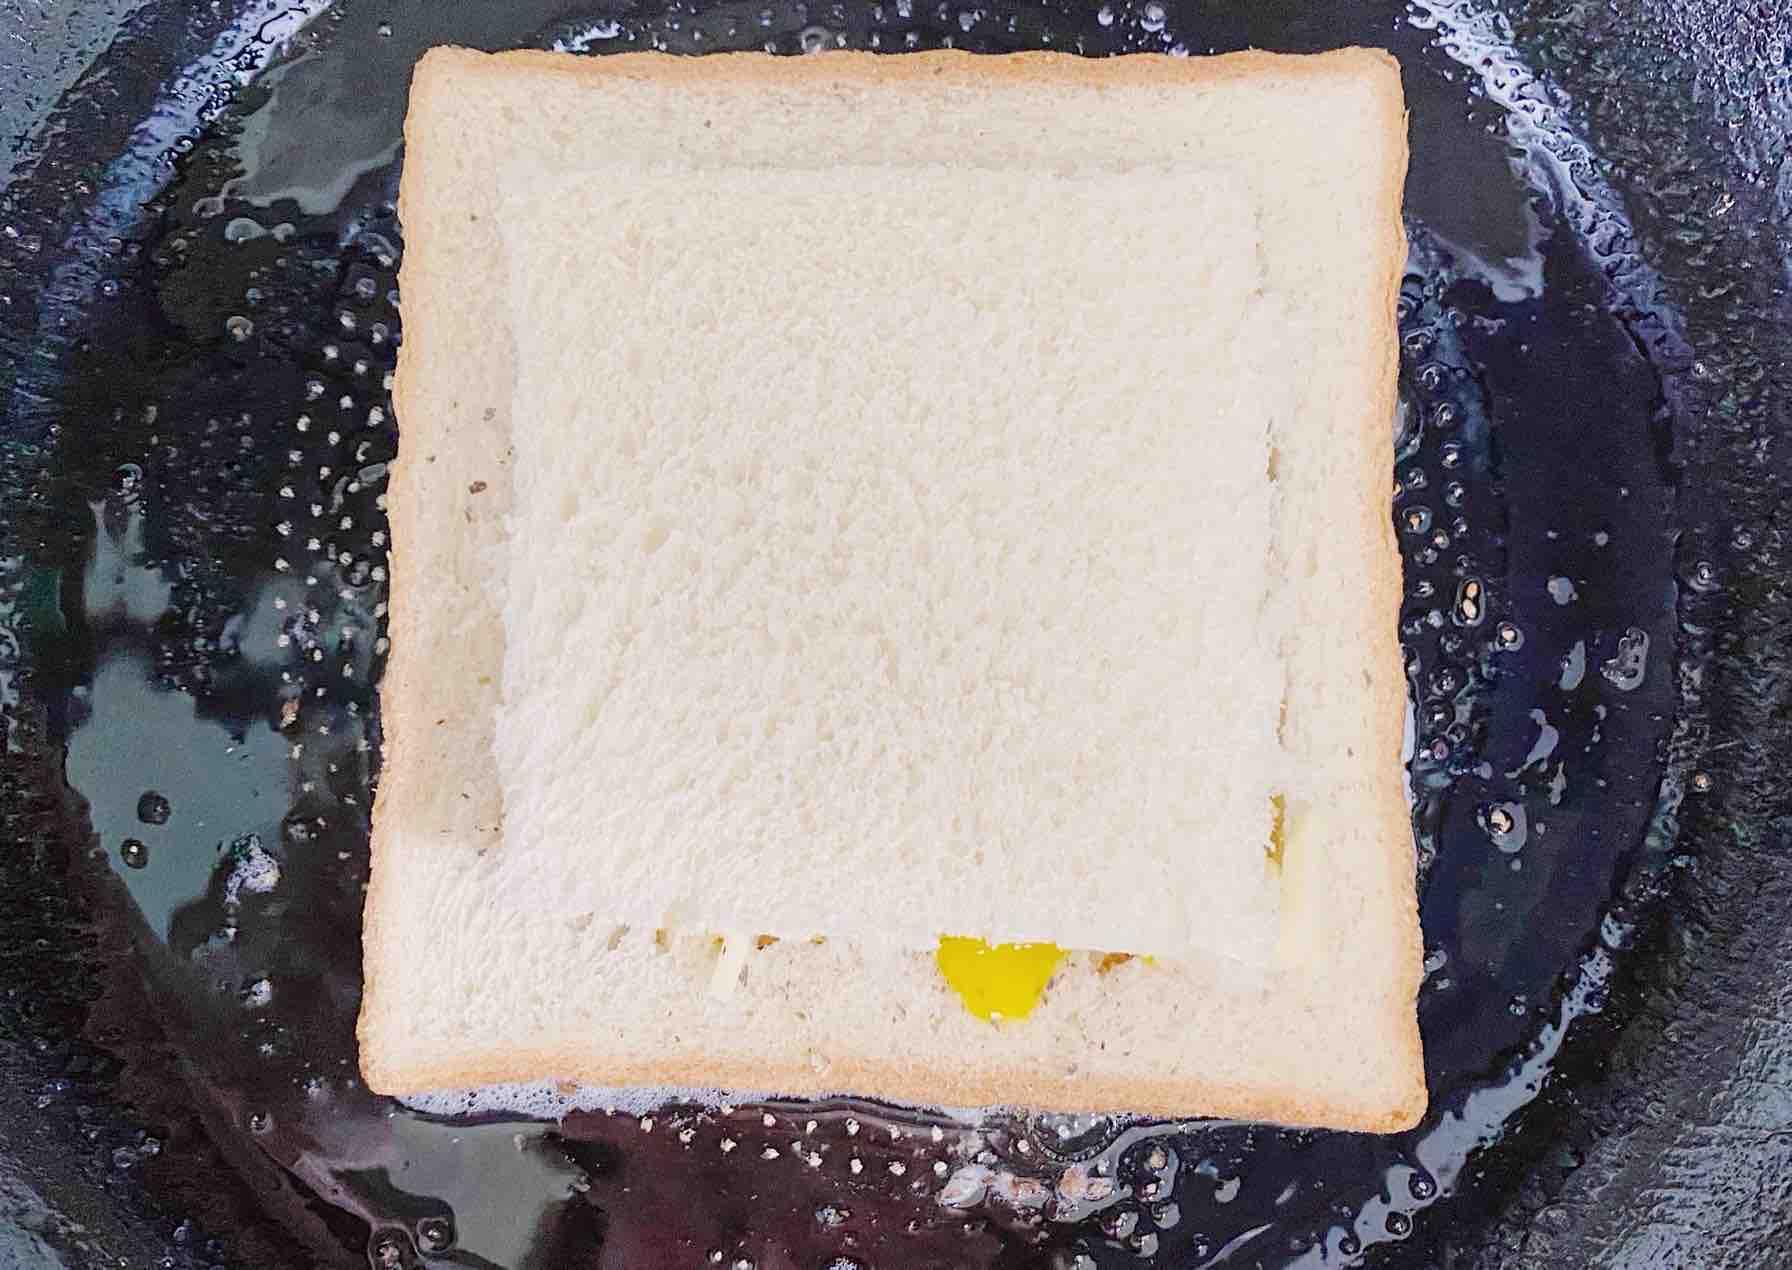 ㊙️食材简单 5分钟脆香芝士吐司怎么做